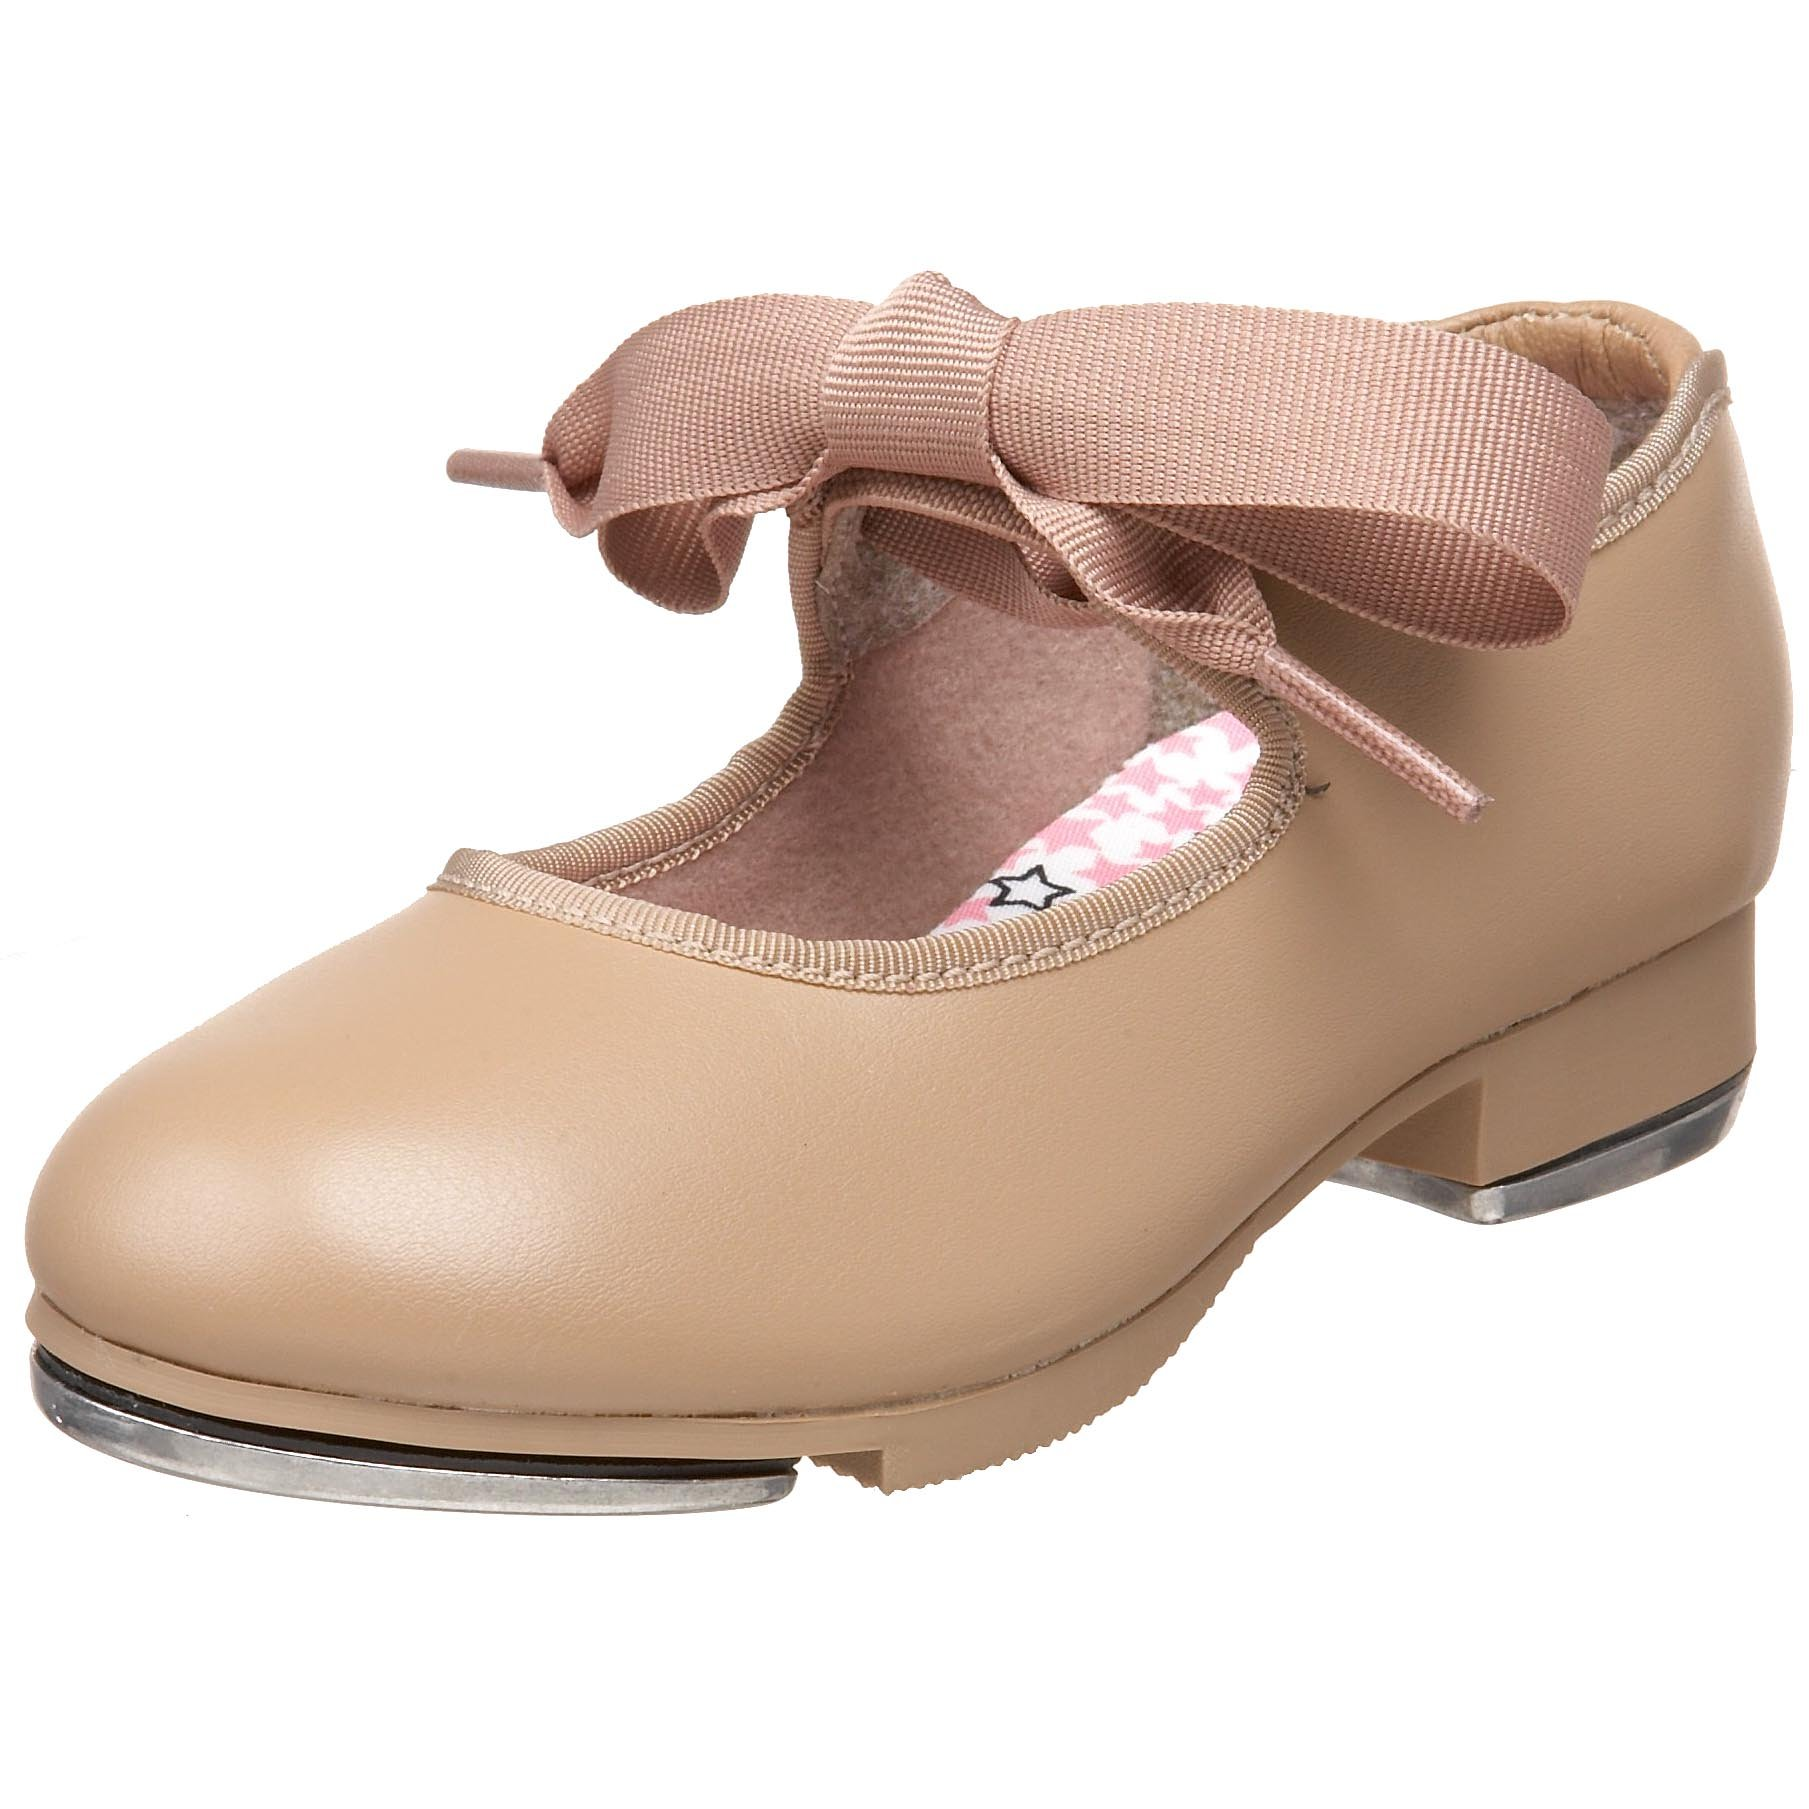 Capezio Jr.Tyette N625C Tap Shoe (Toddler/Little Kid),Caramel,7 M US Toddler